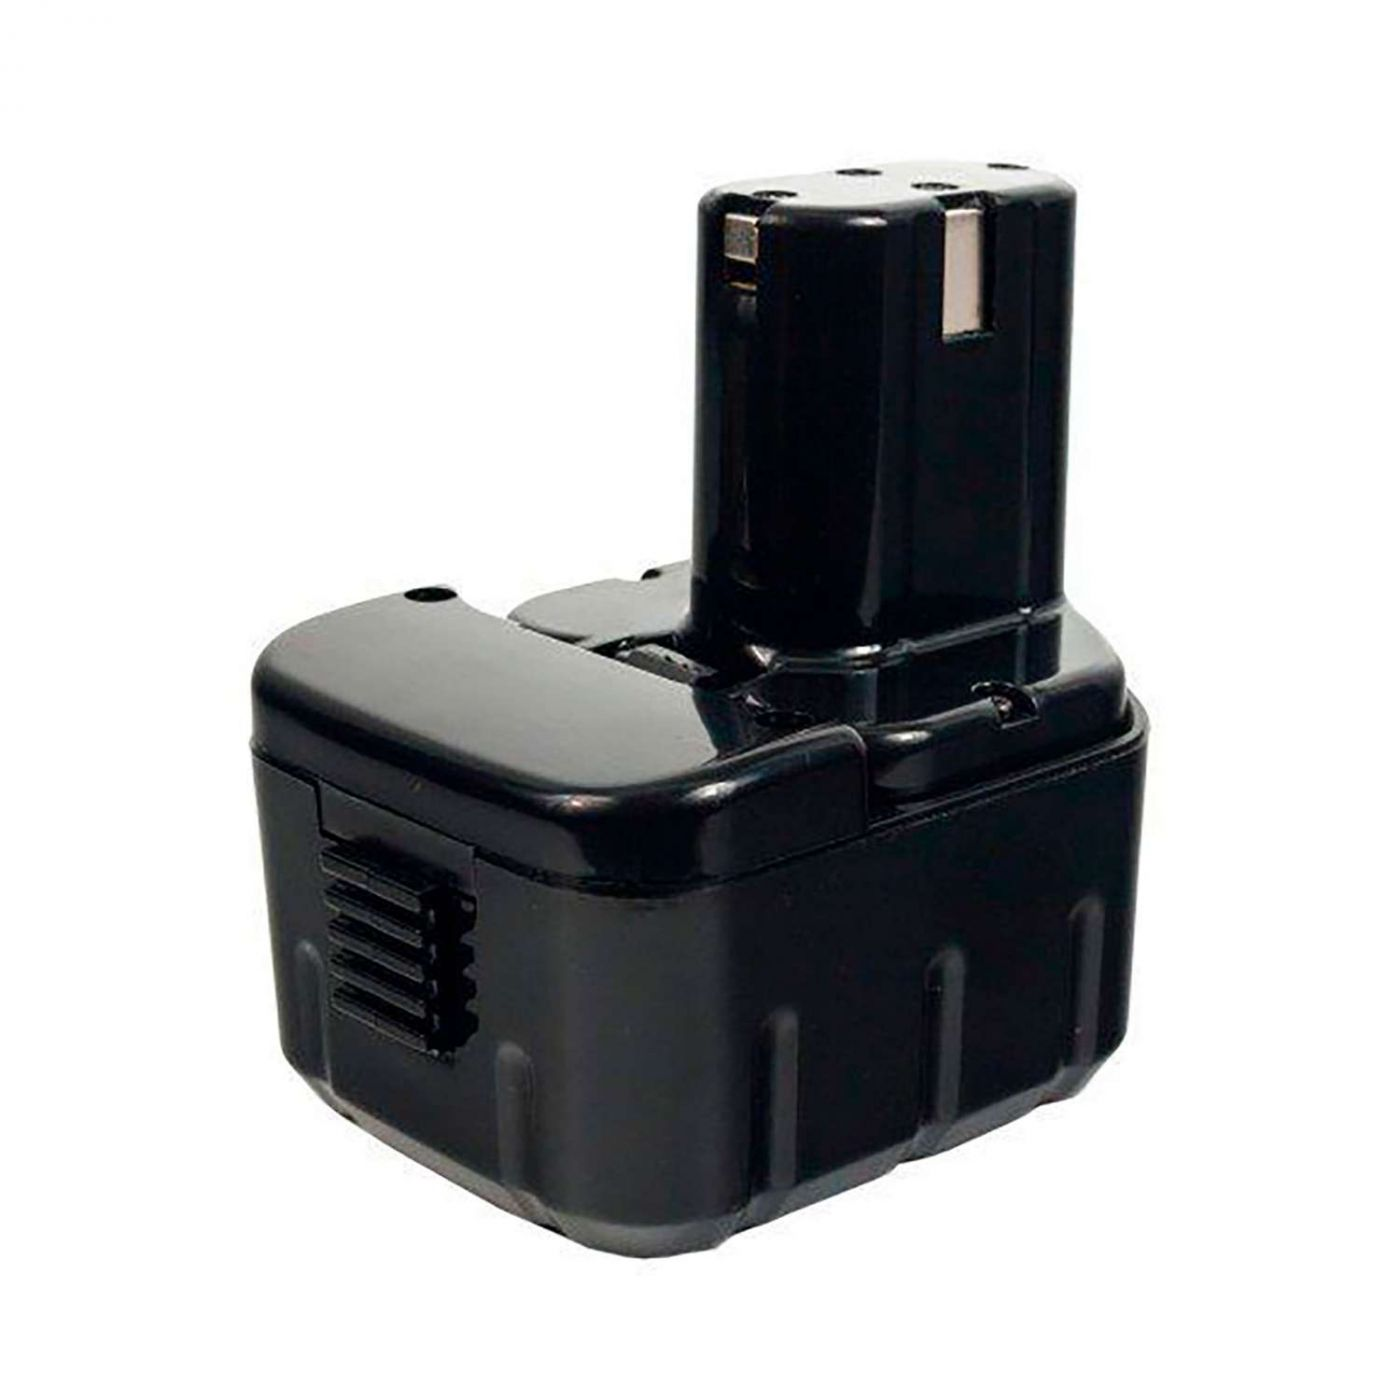 Аккумулятор Практика для HITACHI 12В, 2.0Ач, NiCd, коробка (032-157)